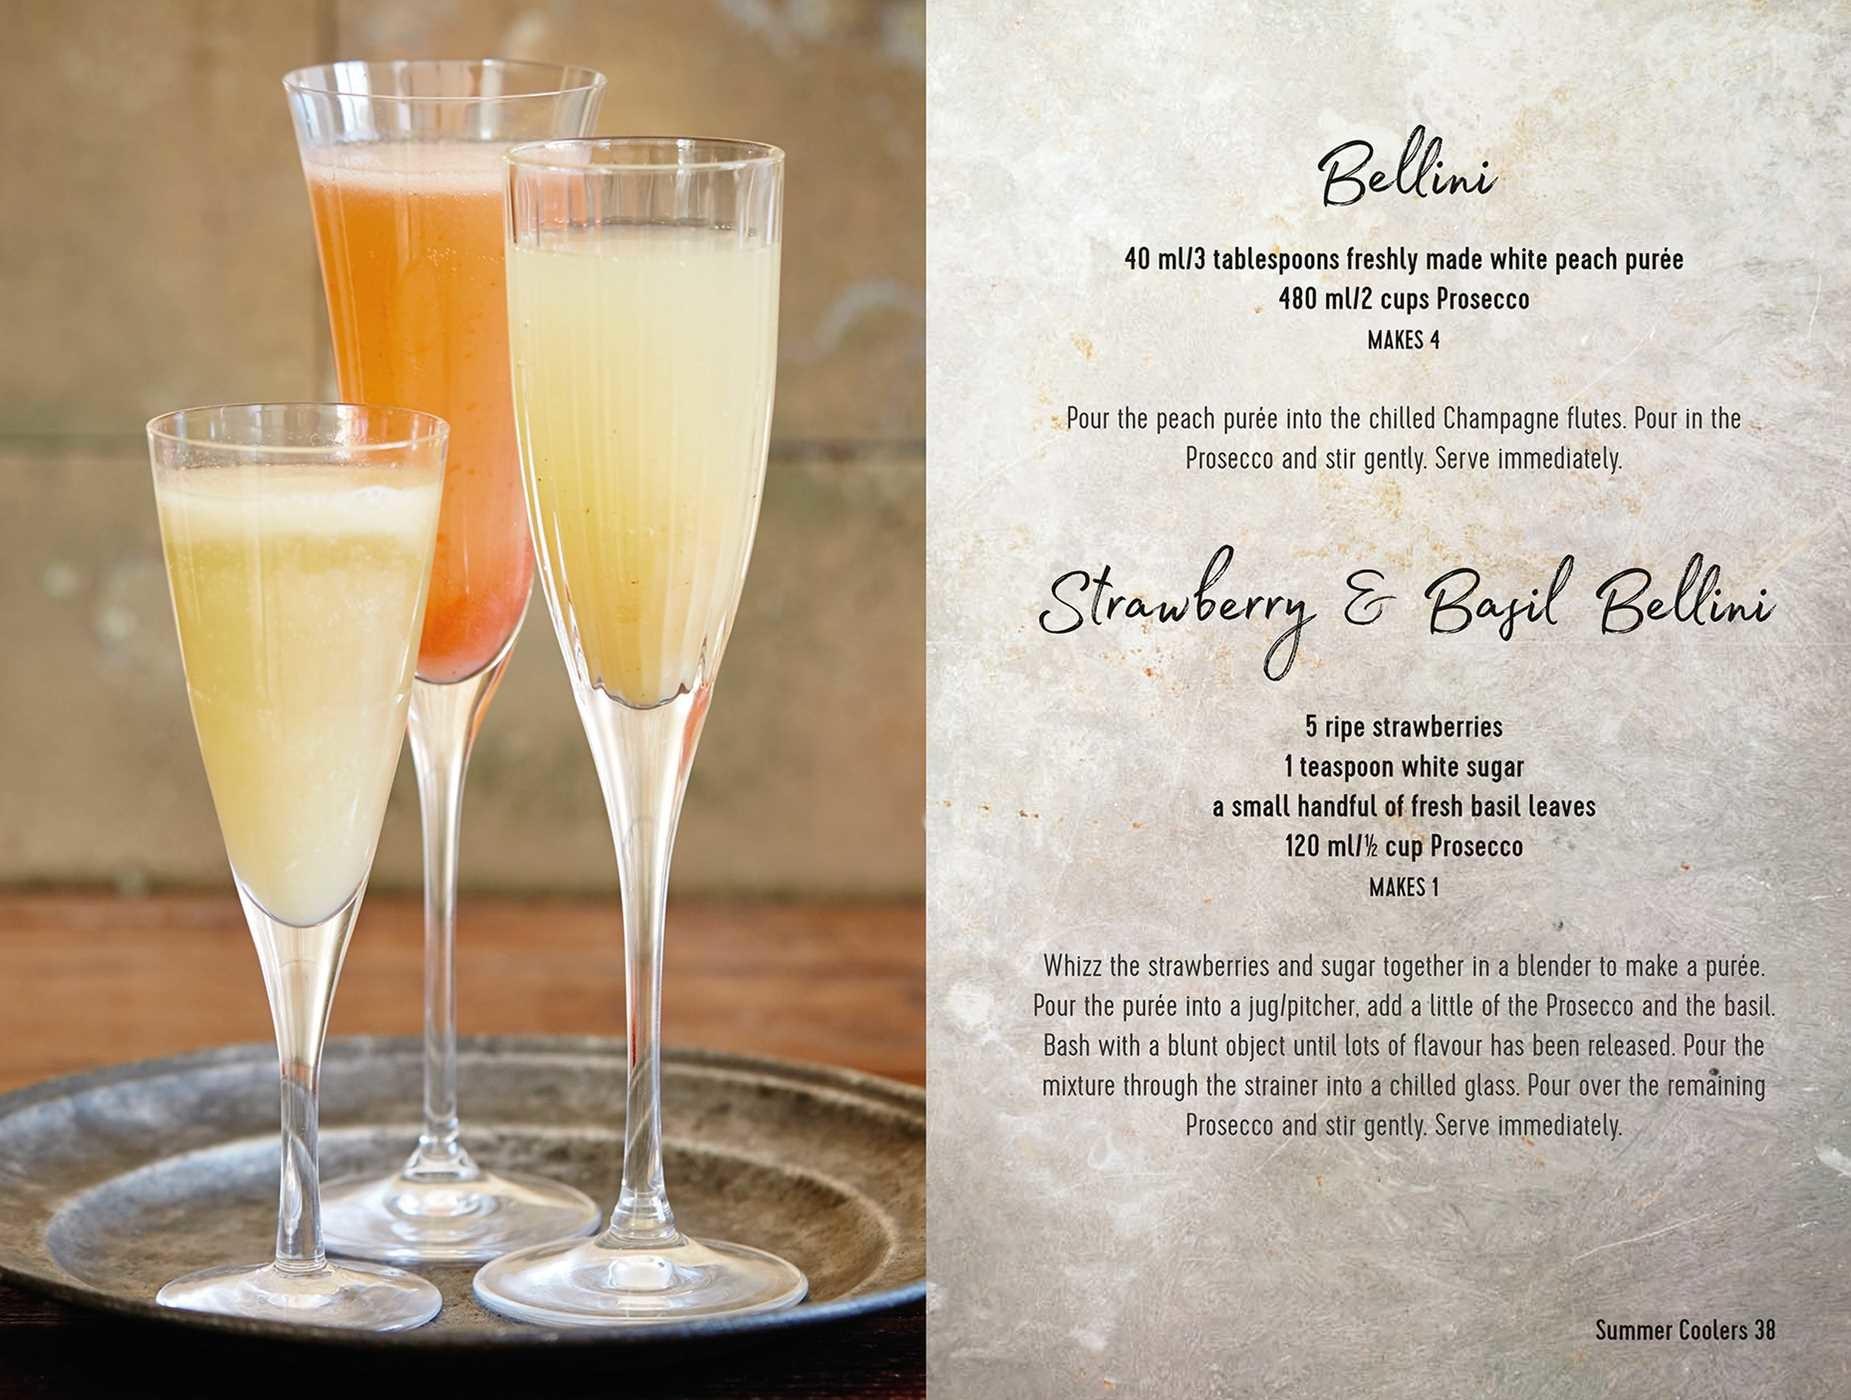 Prosecco cocktails 9781849758956.in02